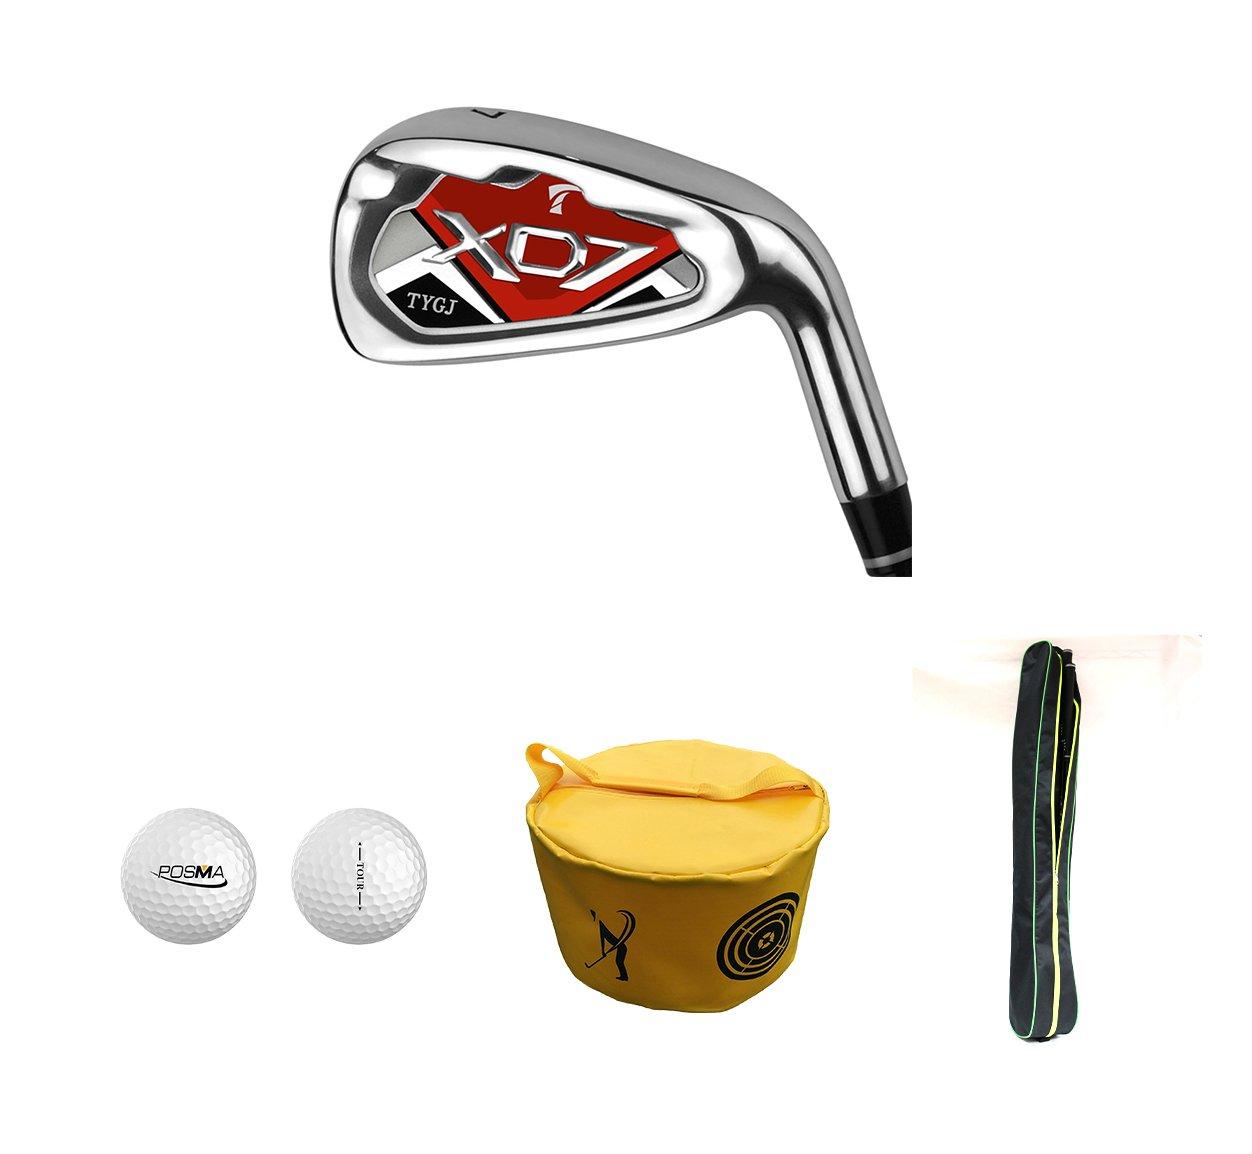 Posma GC701MA - Juego de palos de golf de alta calidad para ...